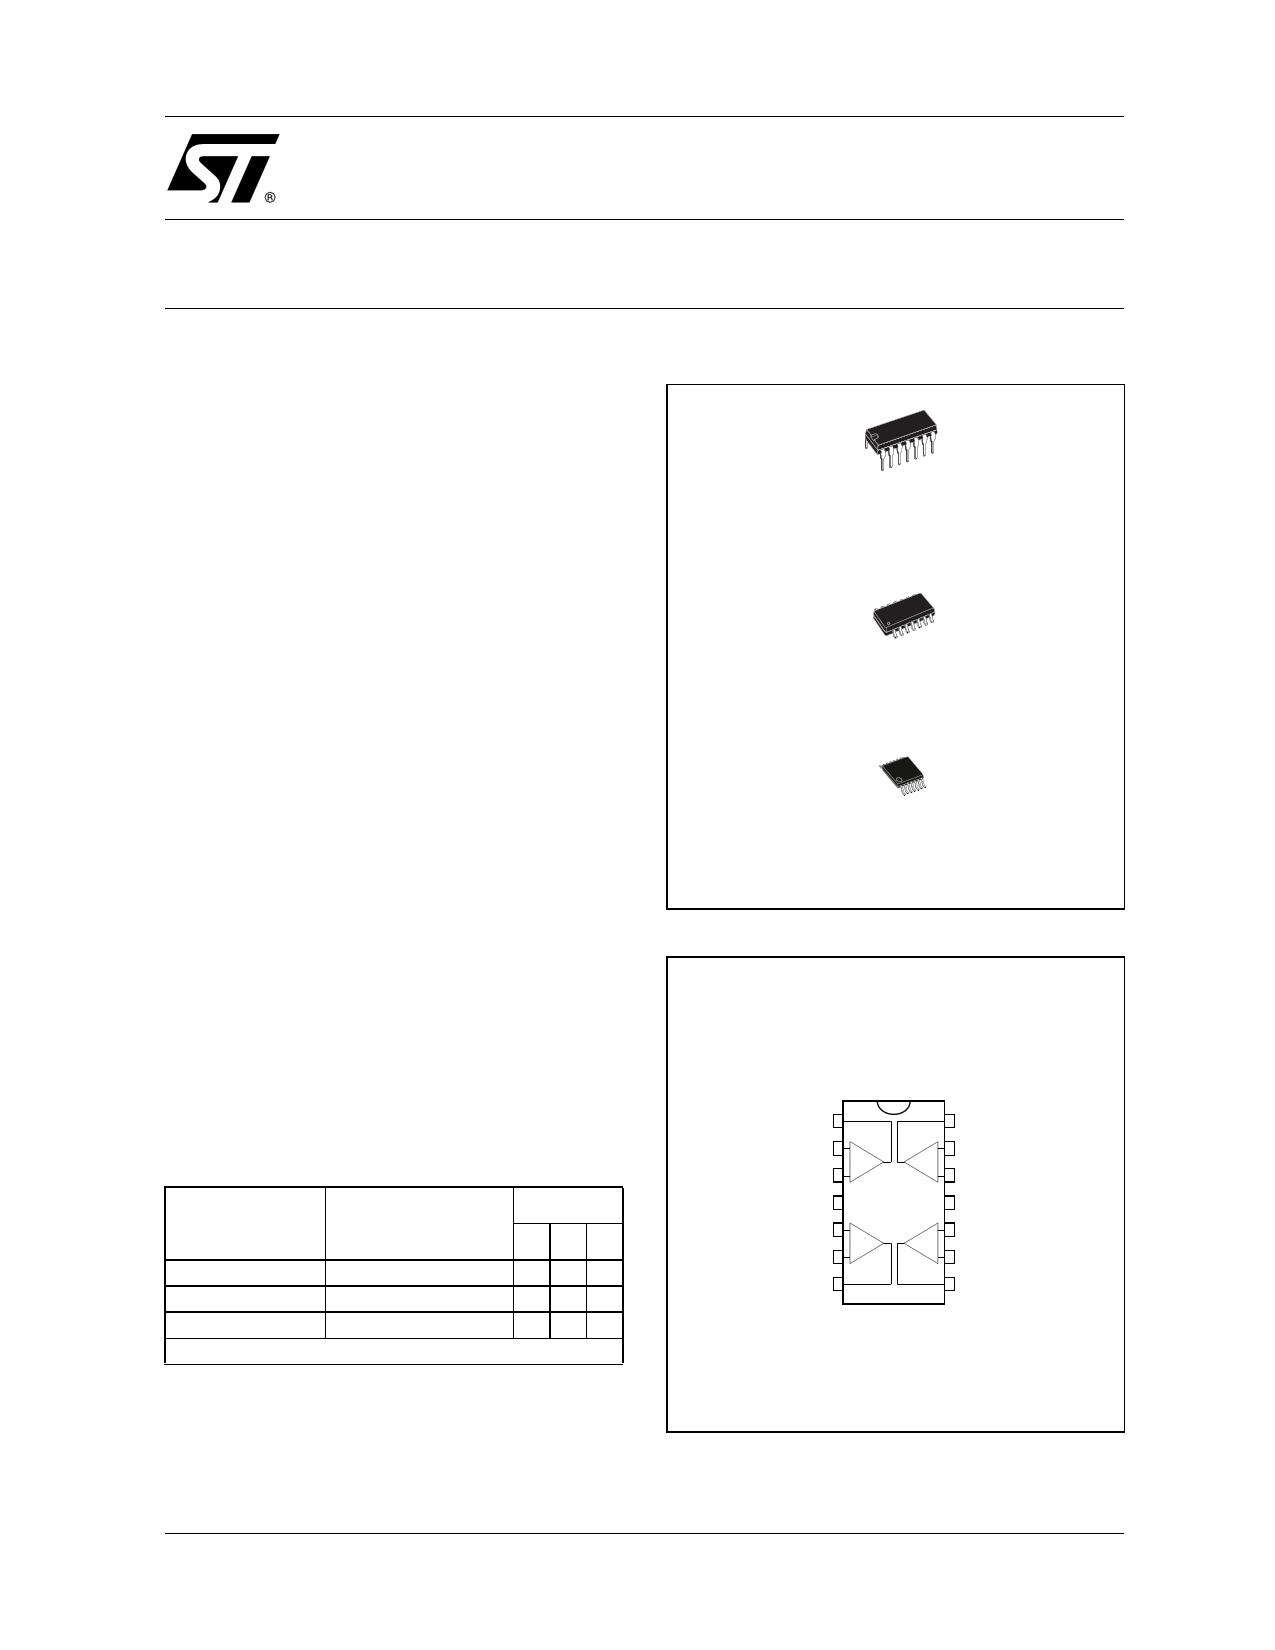 TS27M4I Datasheet, TS27M4I PDF,ピン配置, 機能